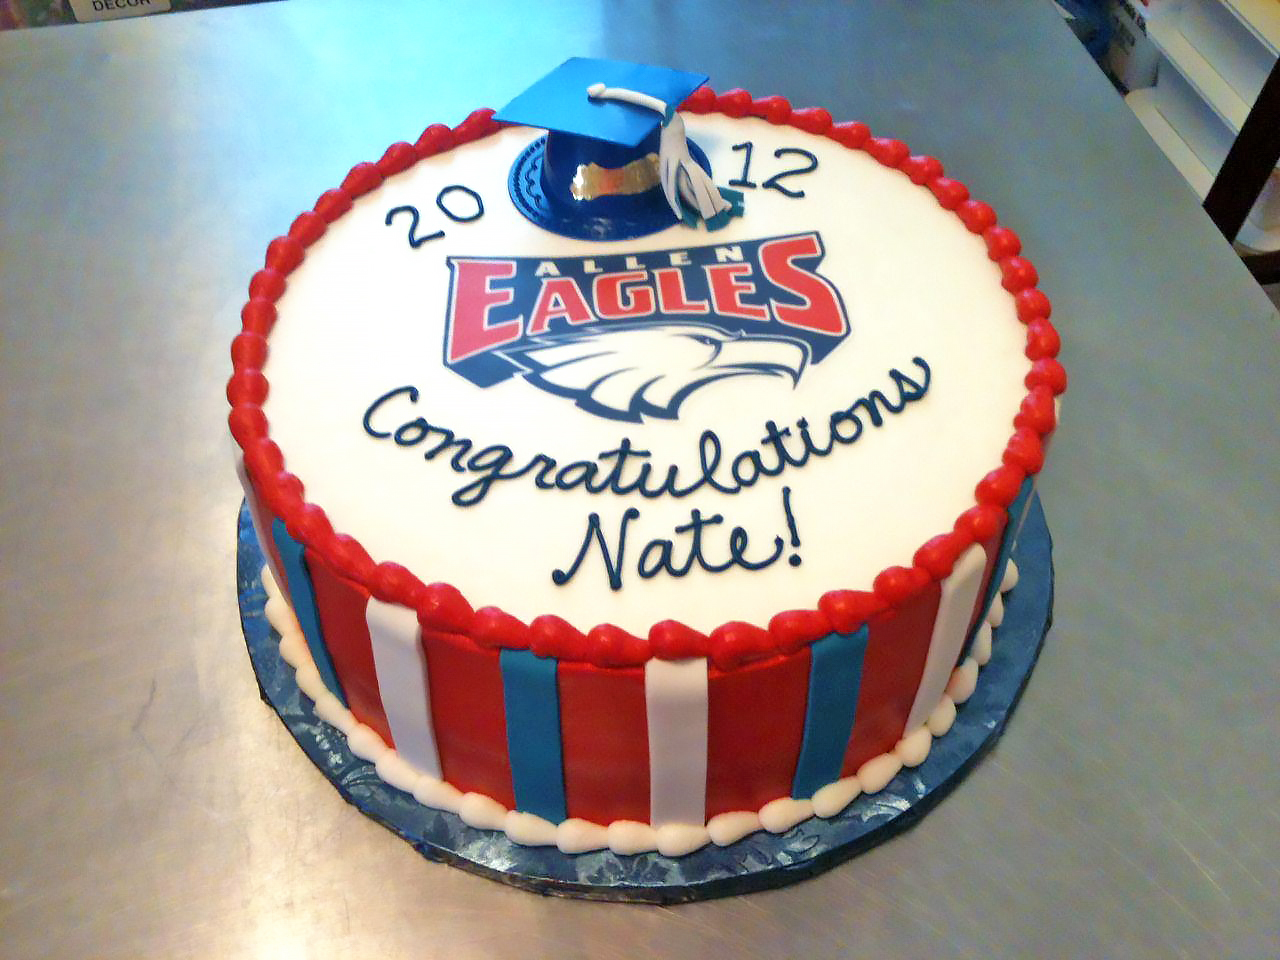 allen eagles cake graduation high school 950 Birthday Cake Delivery In Dallas Texas